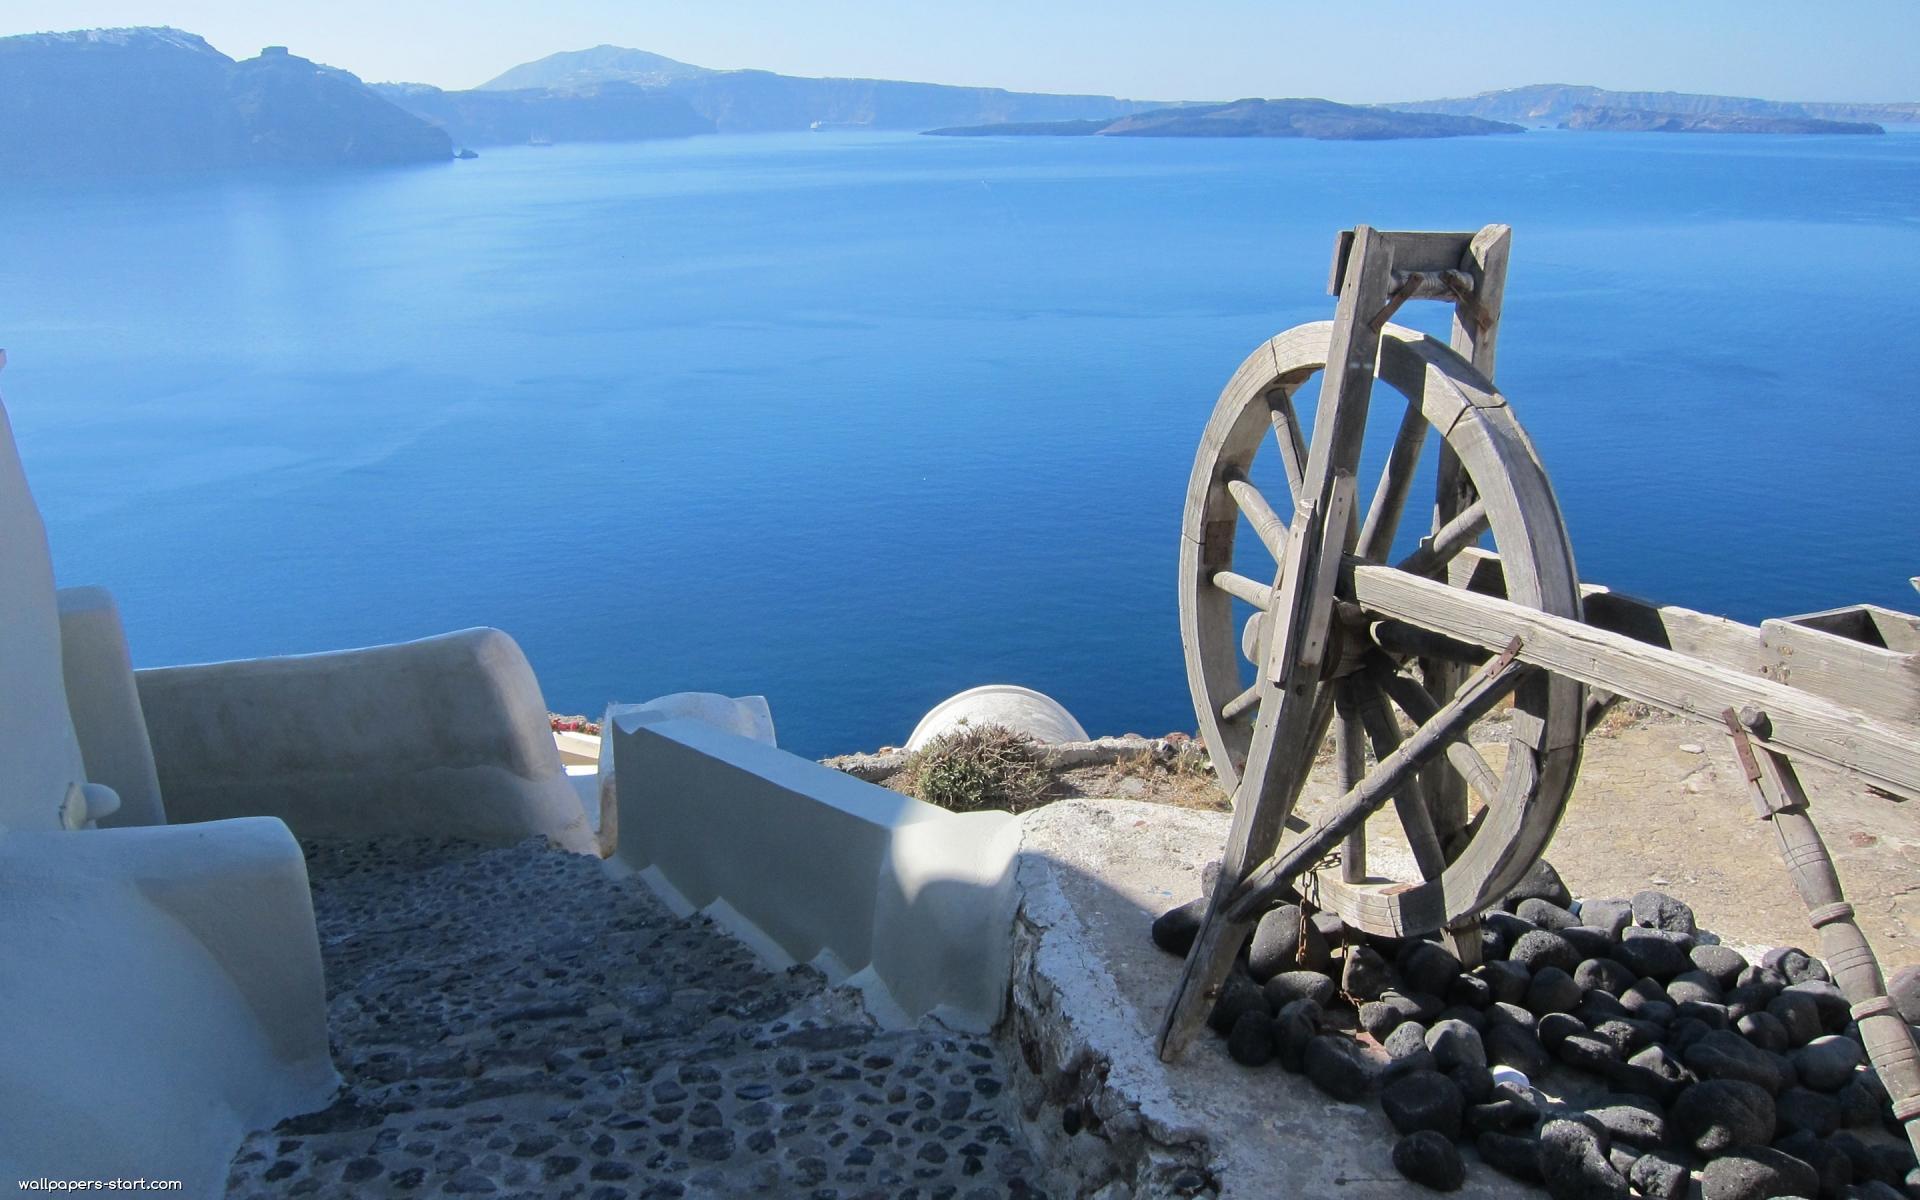 Hd Santorini Wallpaper Santorini Wallpapers Pictures Images